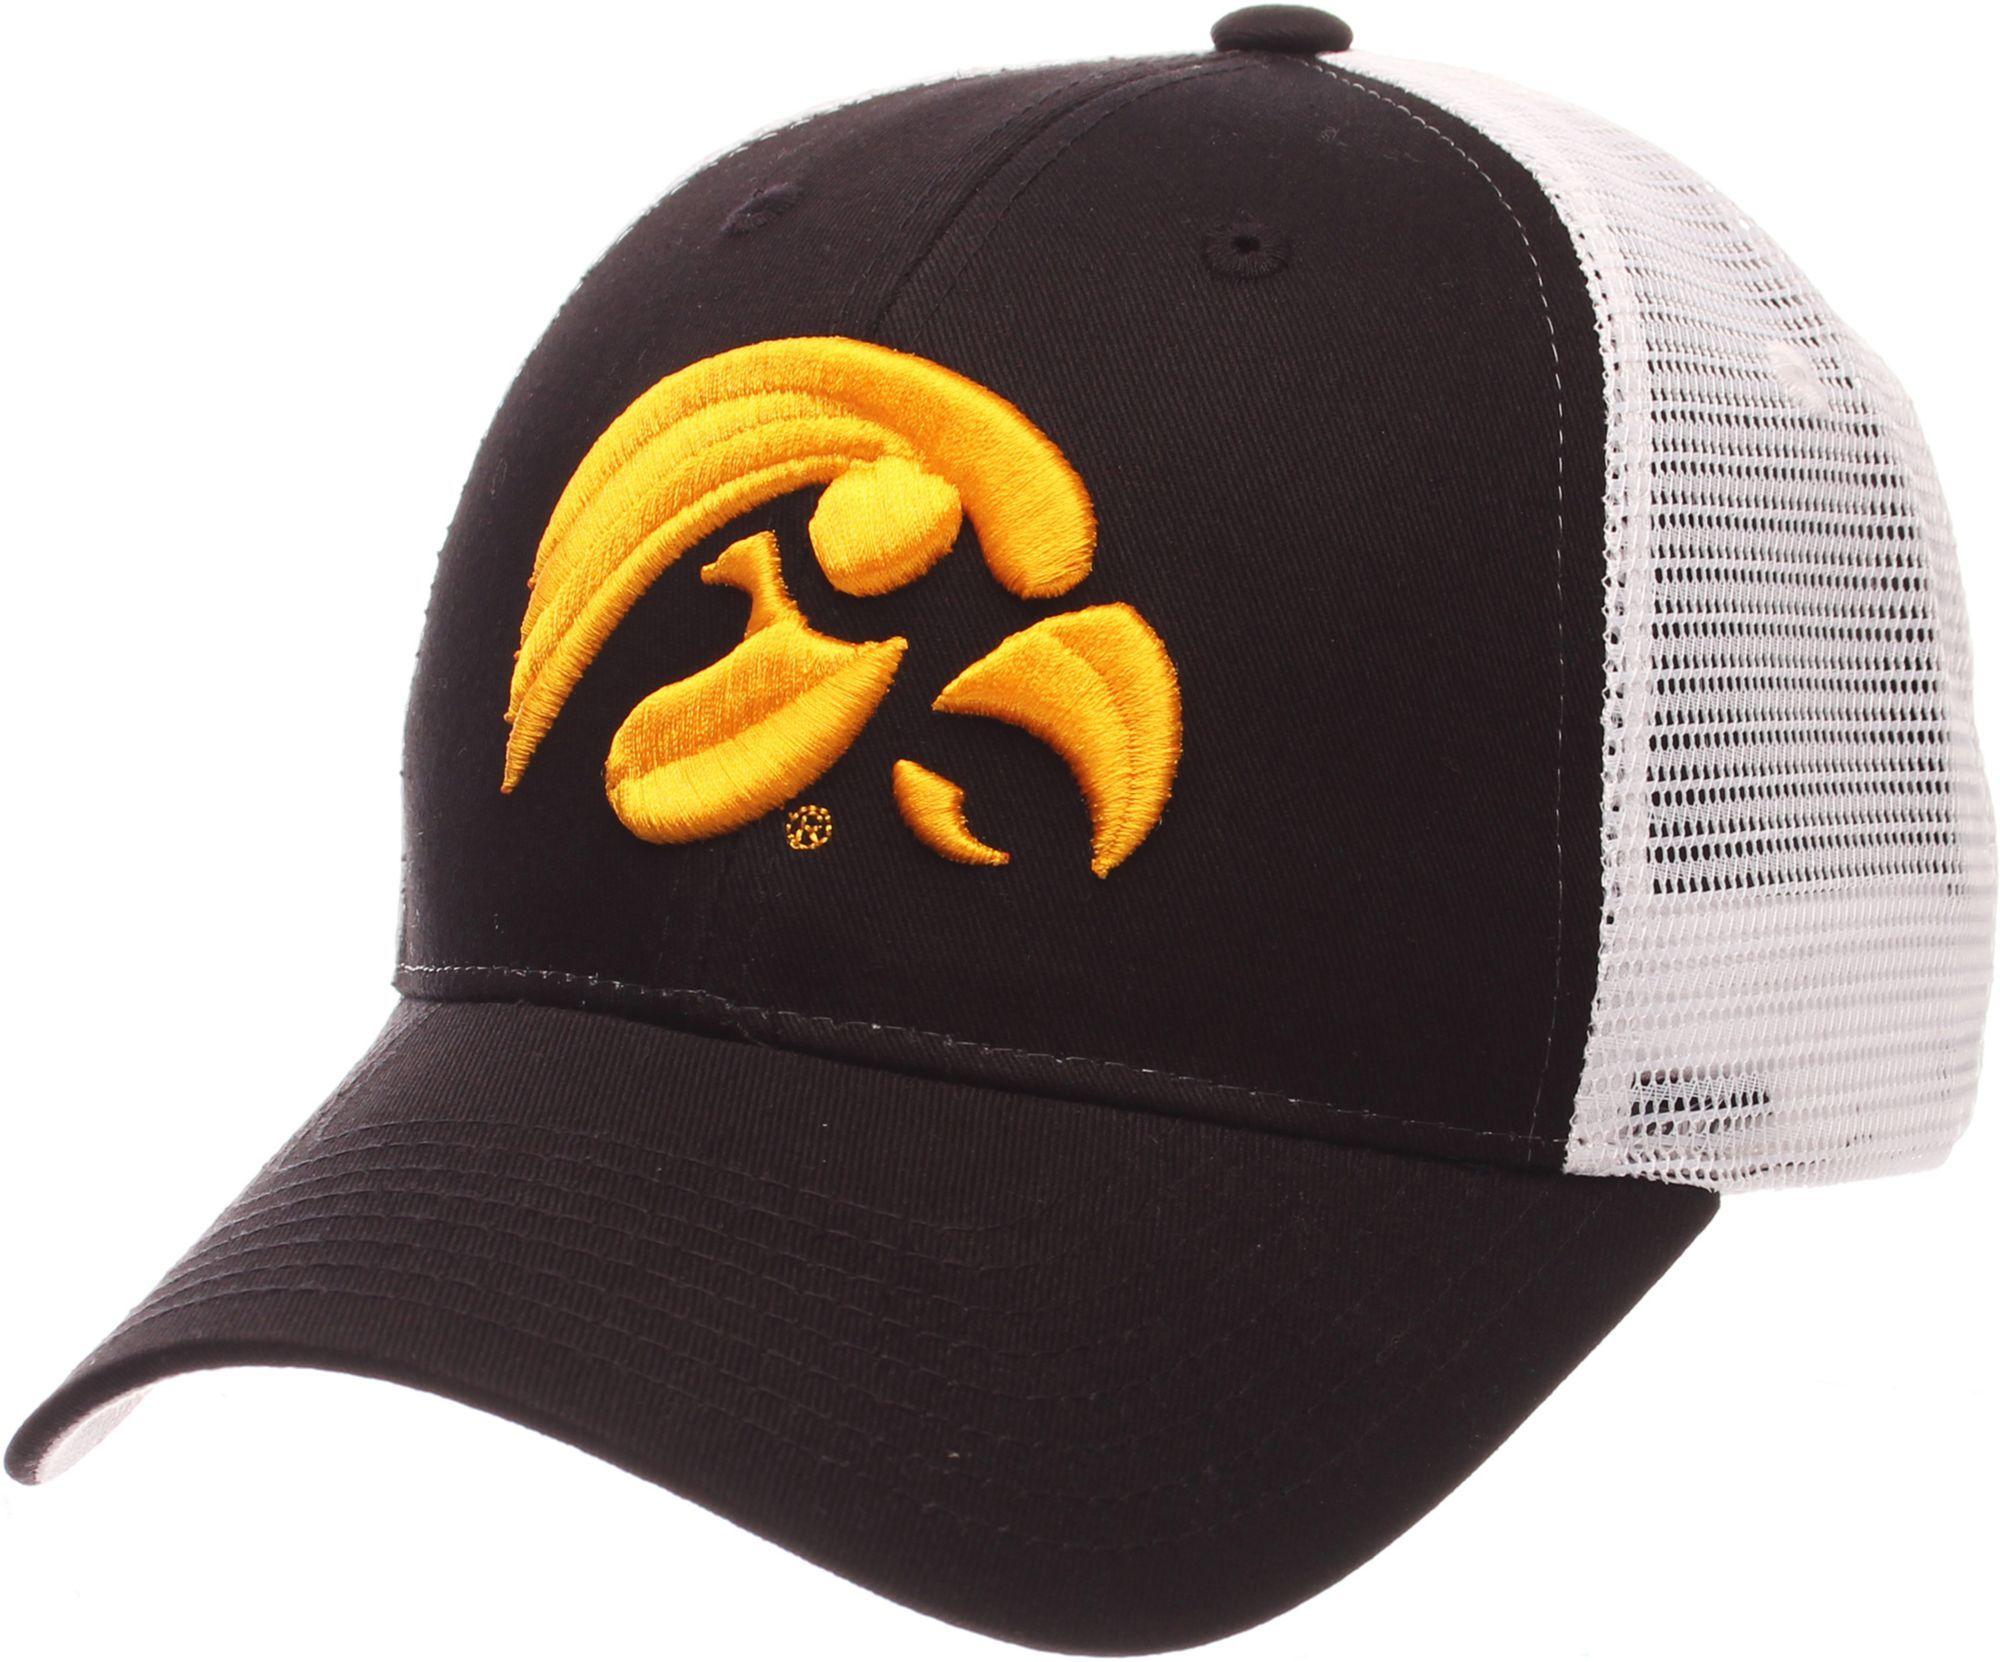 size 40 85820 2db90 Zephyr Men s Iowa Hawkeyes Black White Big Rig Adjustable Hat, Team